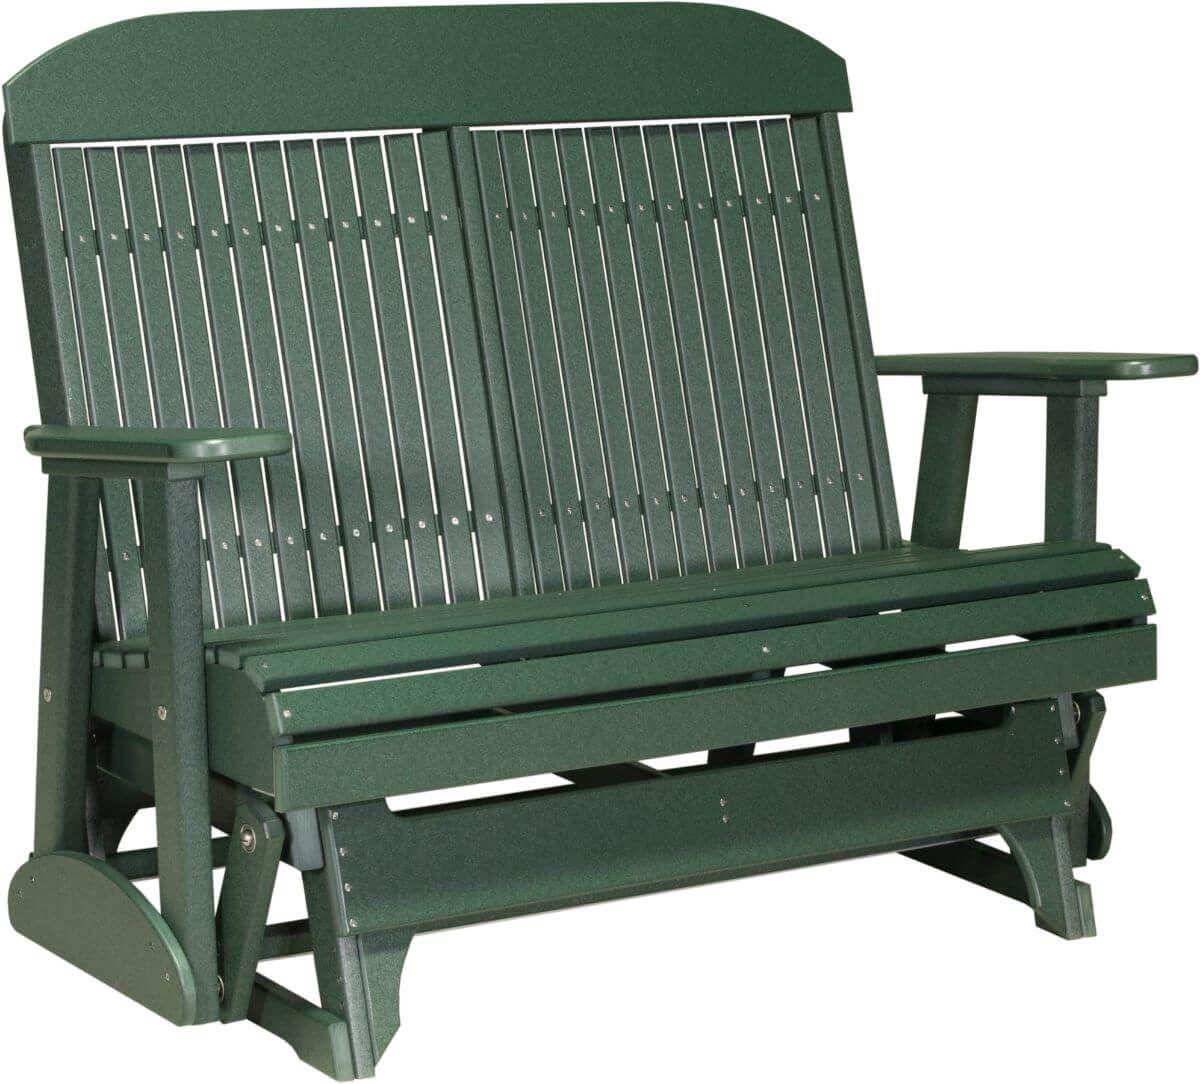 Green Stockton Outdoor Glider Bench